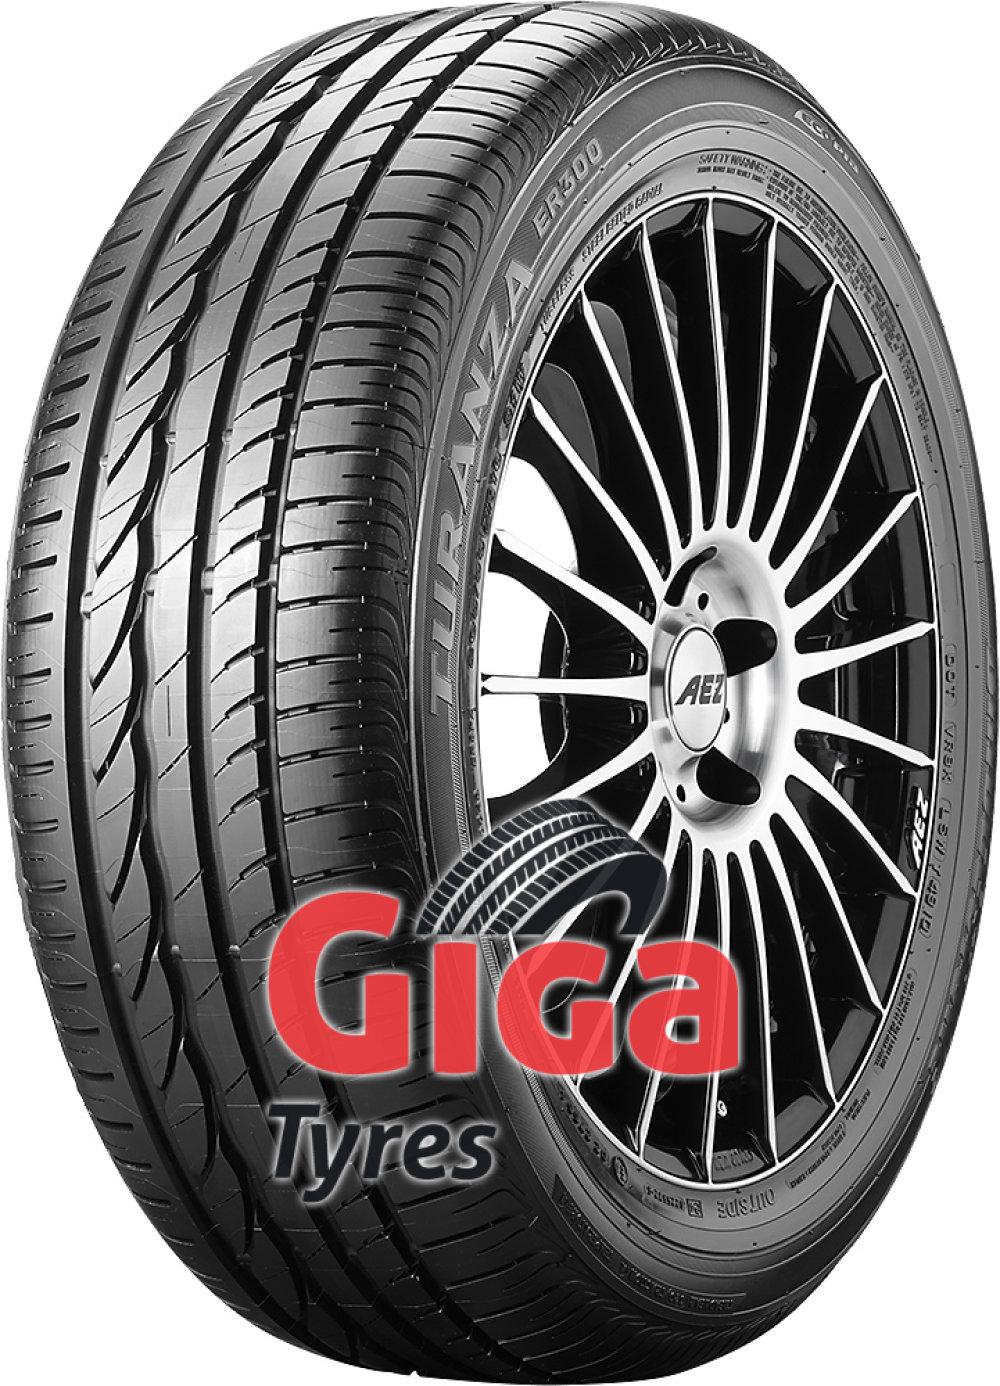 Bridgestone Turanza ER 300 Ecopia ( 205/55 R16 94H XL with rim protection (MFS) )